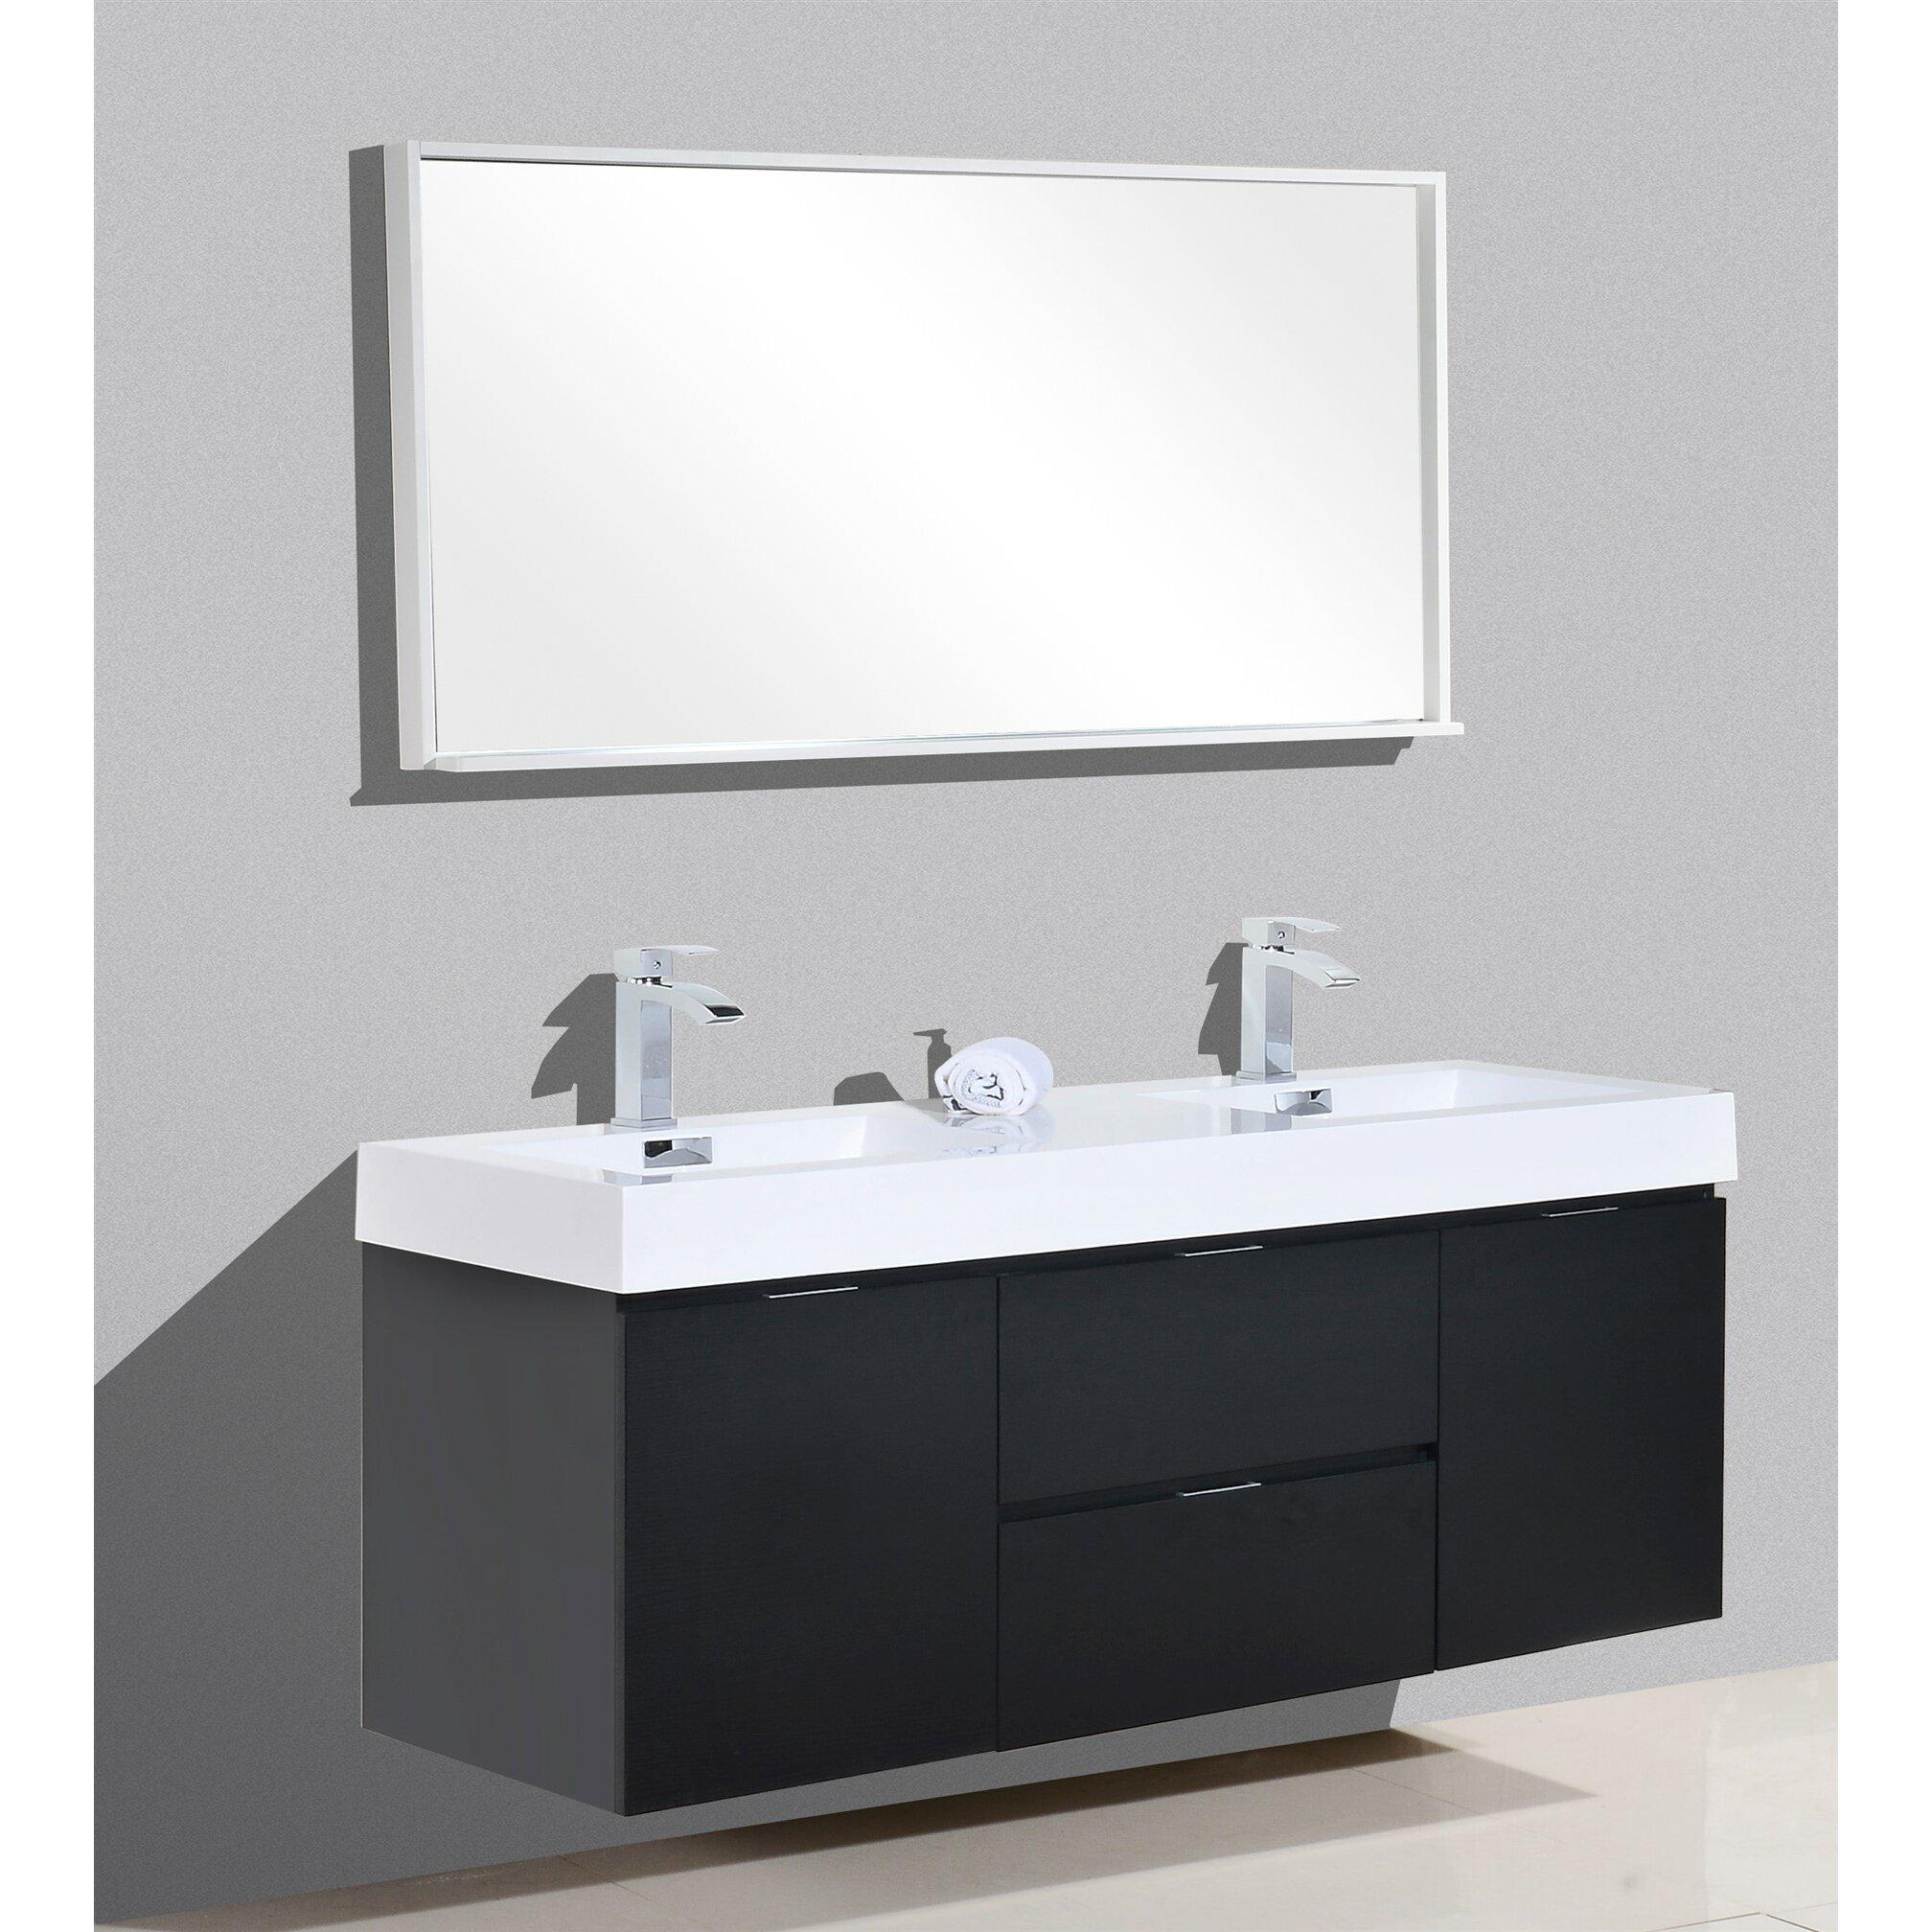 Modern Bathroom Furniture Cabinets Modern Bathroom Furniture Sets Modern Bathroom Furniture Sets